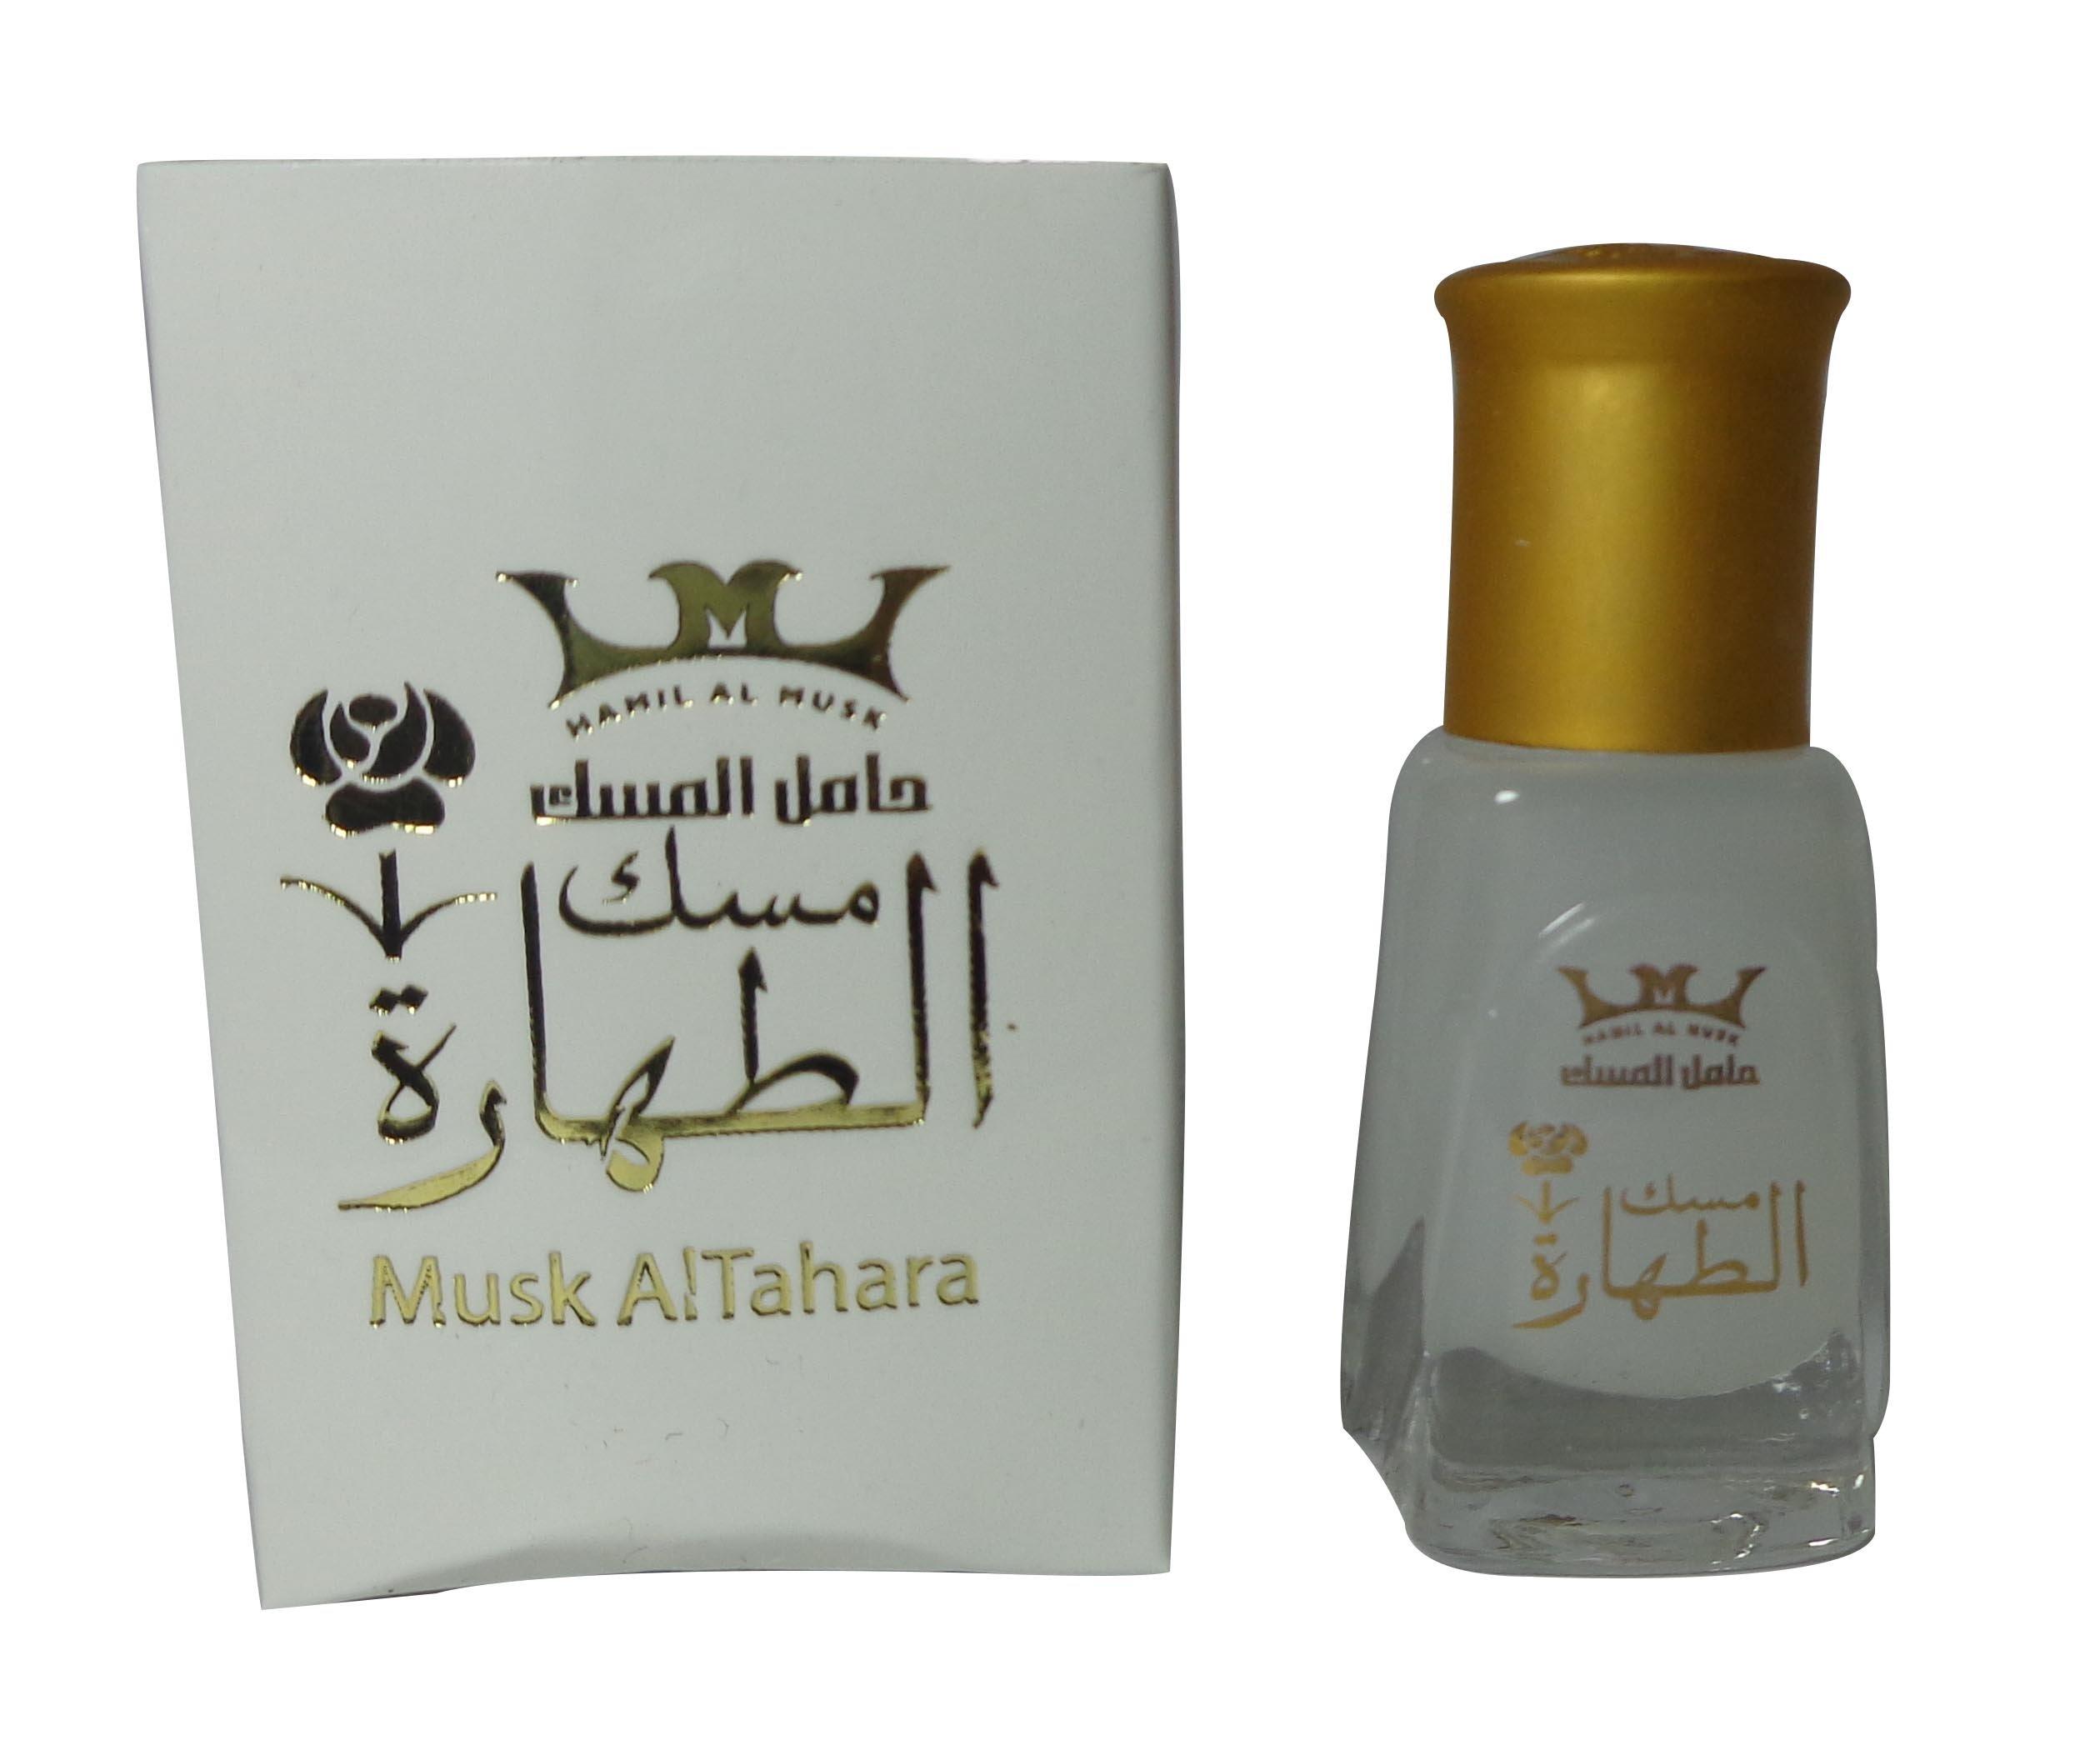 Pure Saudi Arabian Musk Al tahara Altahara Alcohol Free 5ml مسك أبيــض درجة أولى (12 Bottle = 60 ml) by bonballoon (Image #3)